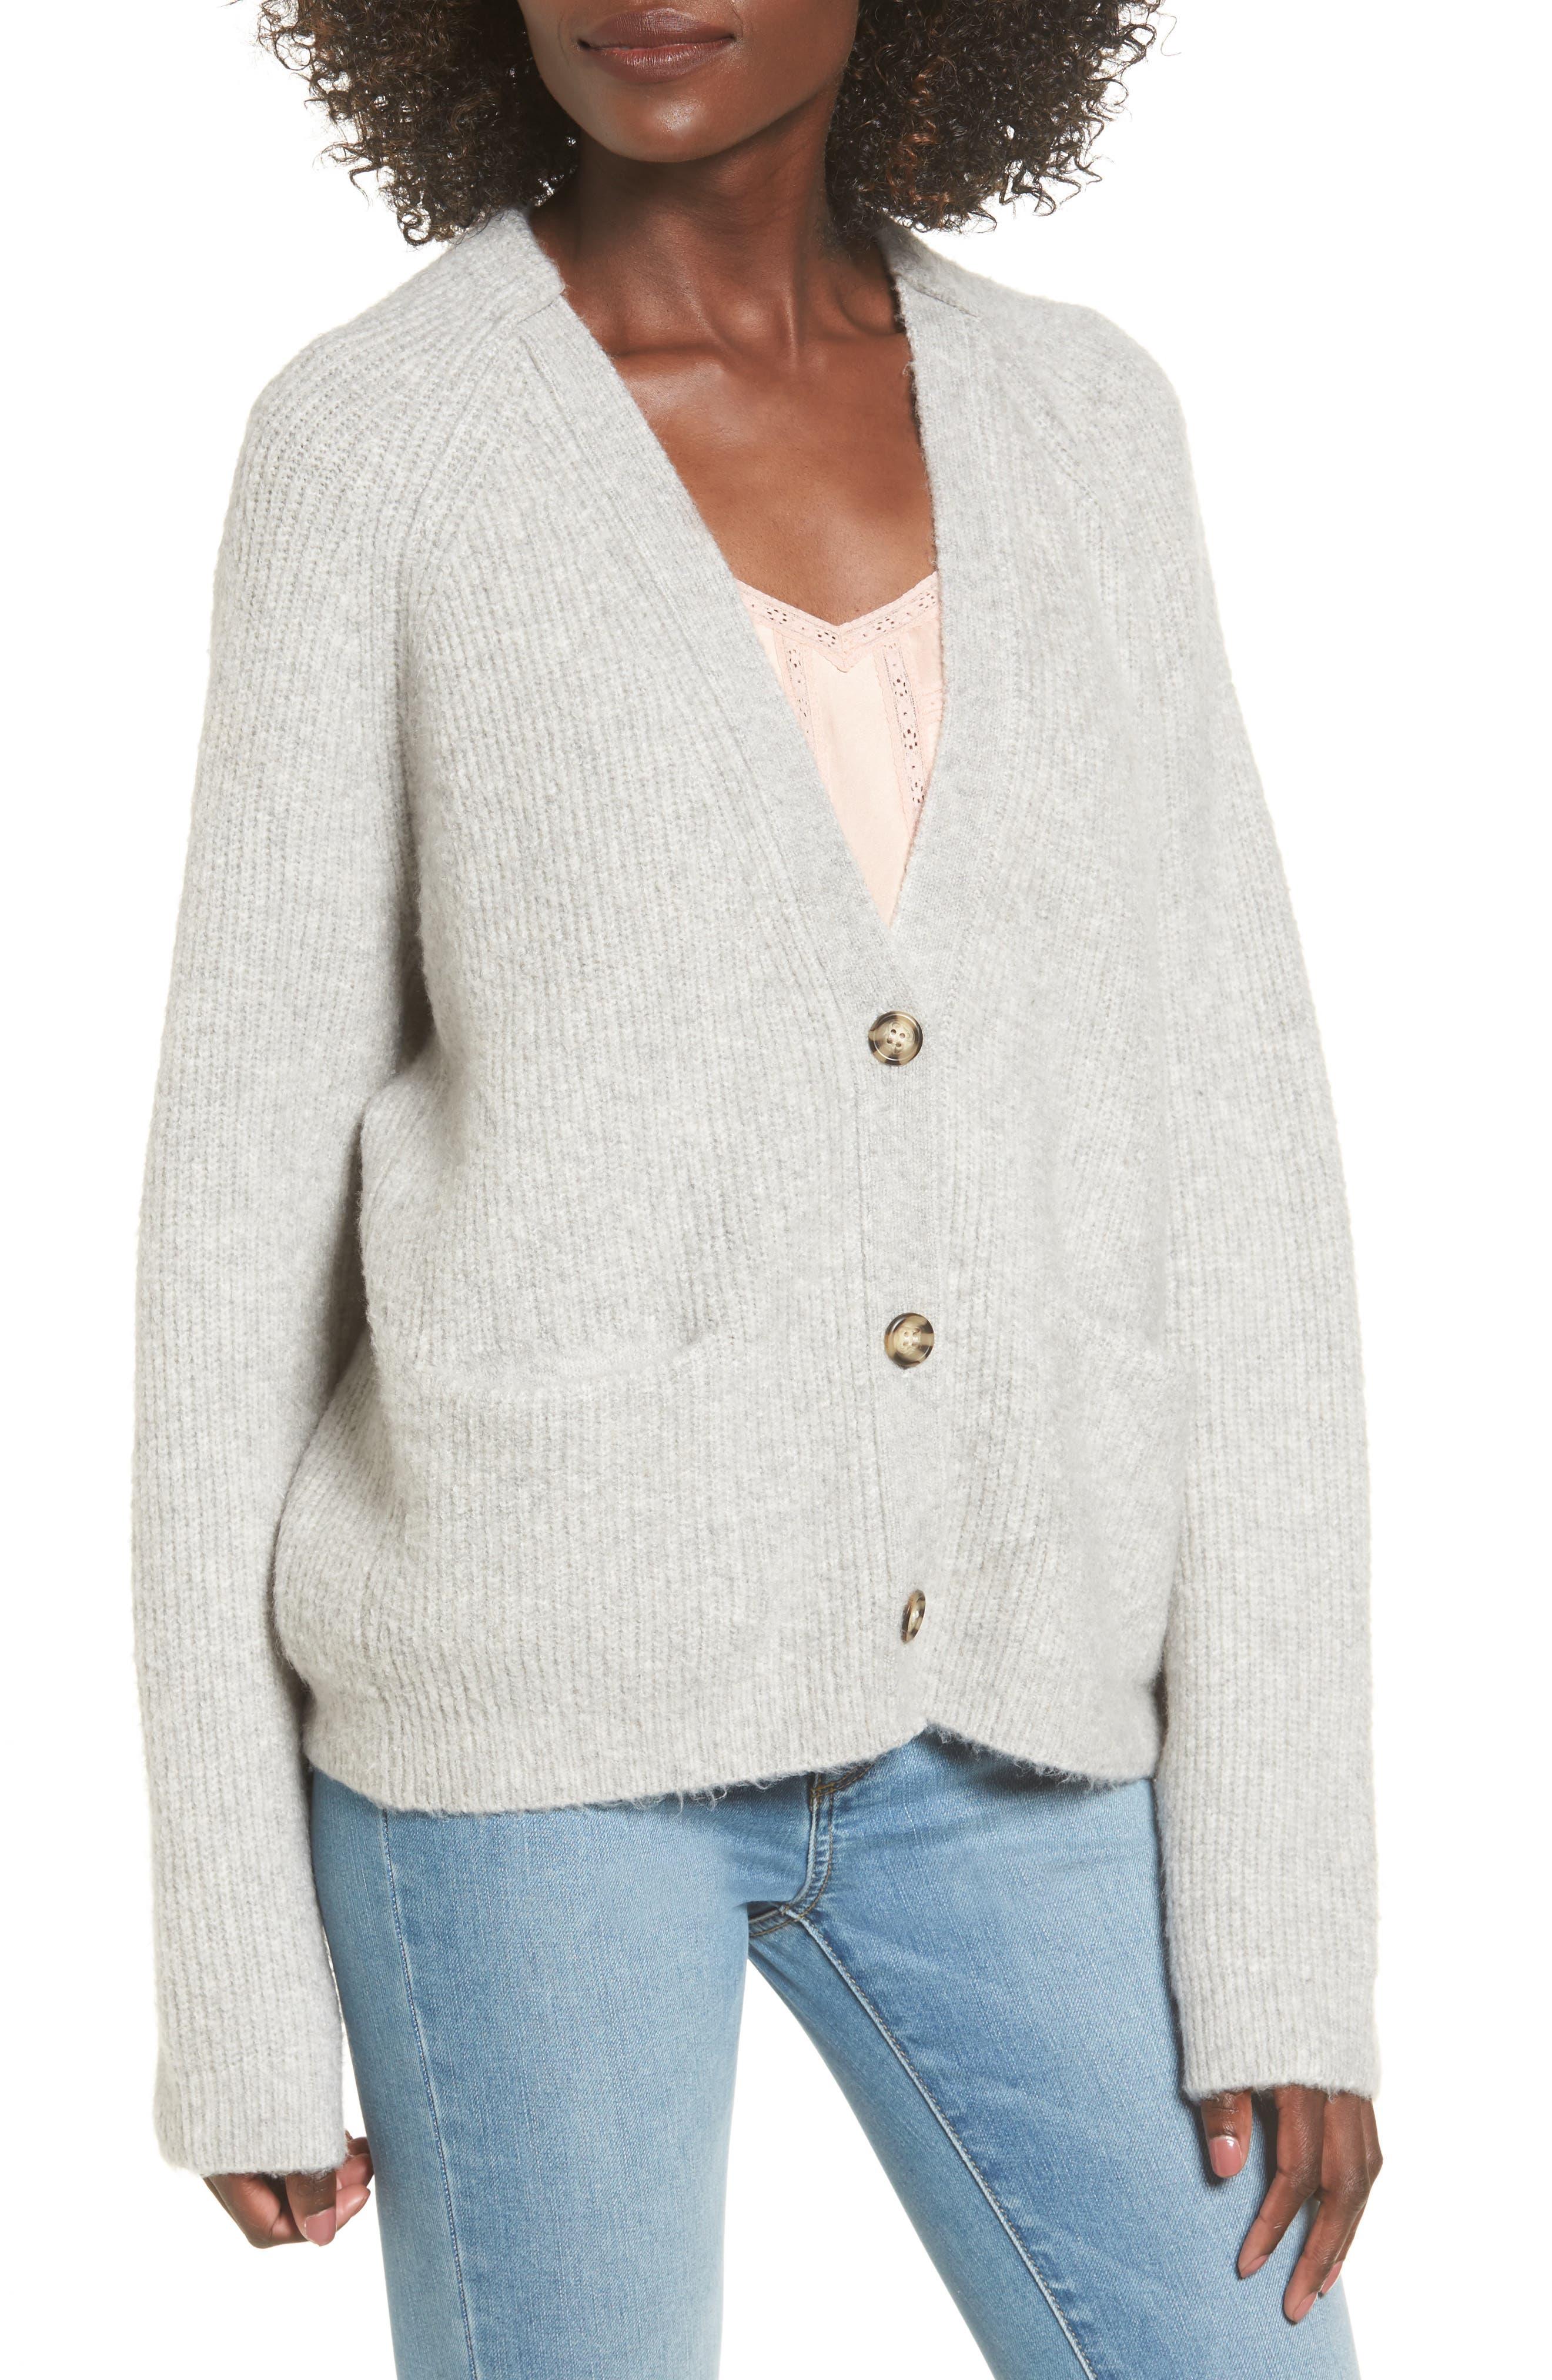 Cardigan Sweater,                         Main,                         color, Grey Med Htr